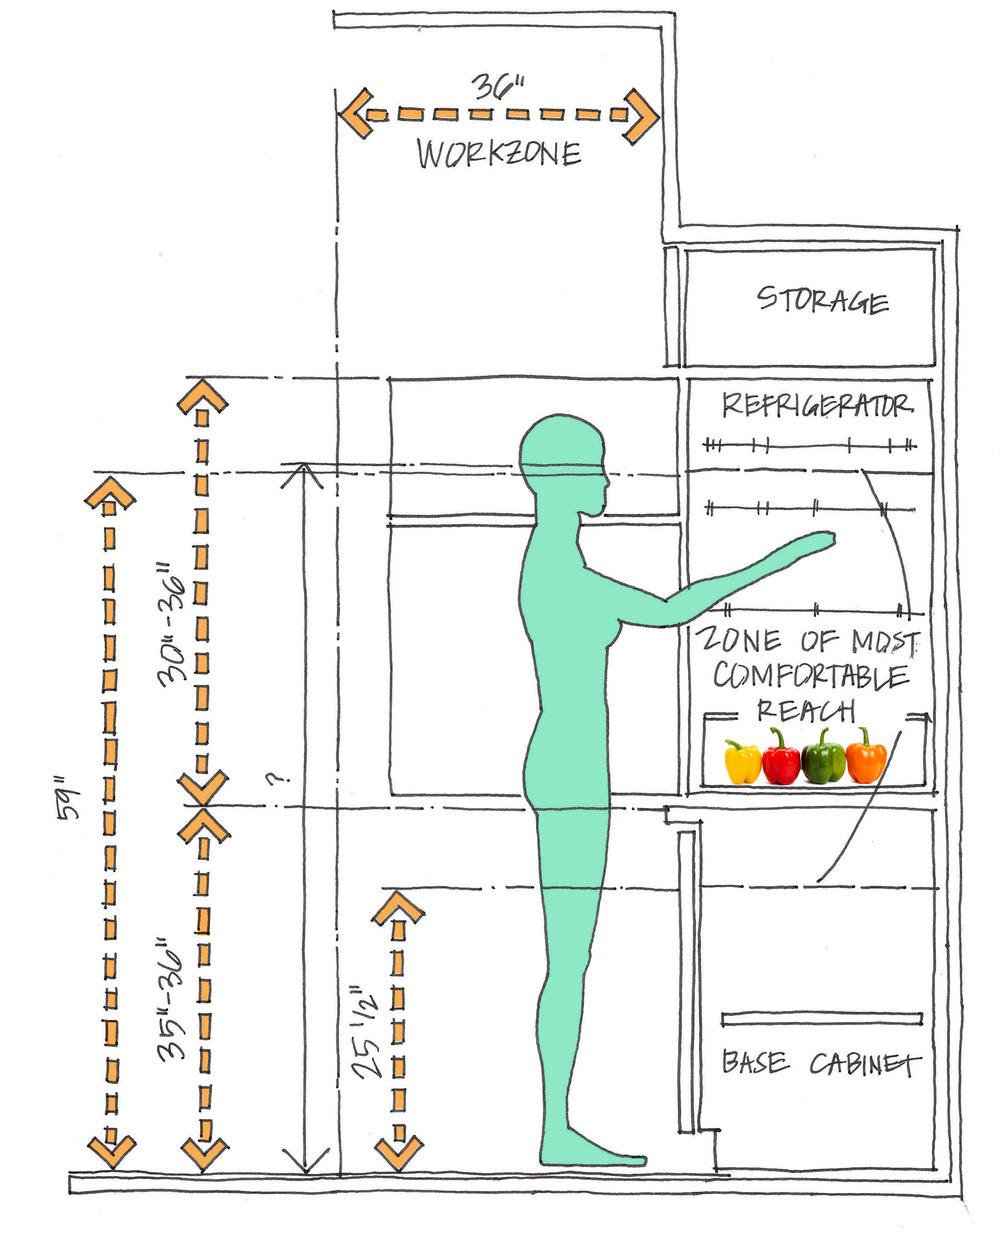 ERGONOMICS — Sozo Studio - Kitchen Cabinet Height From Counter